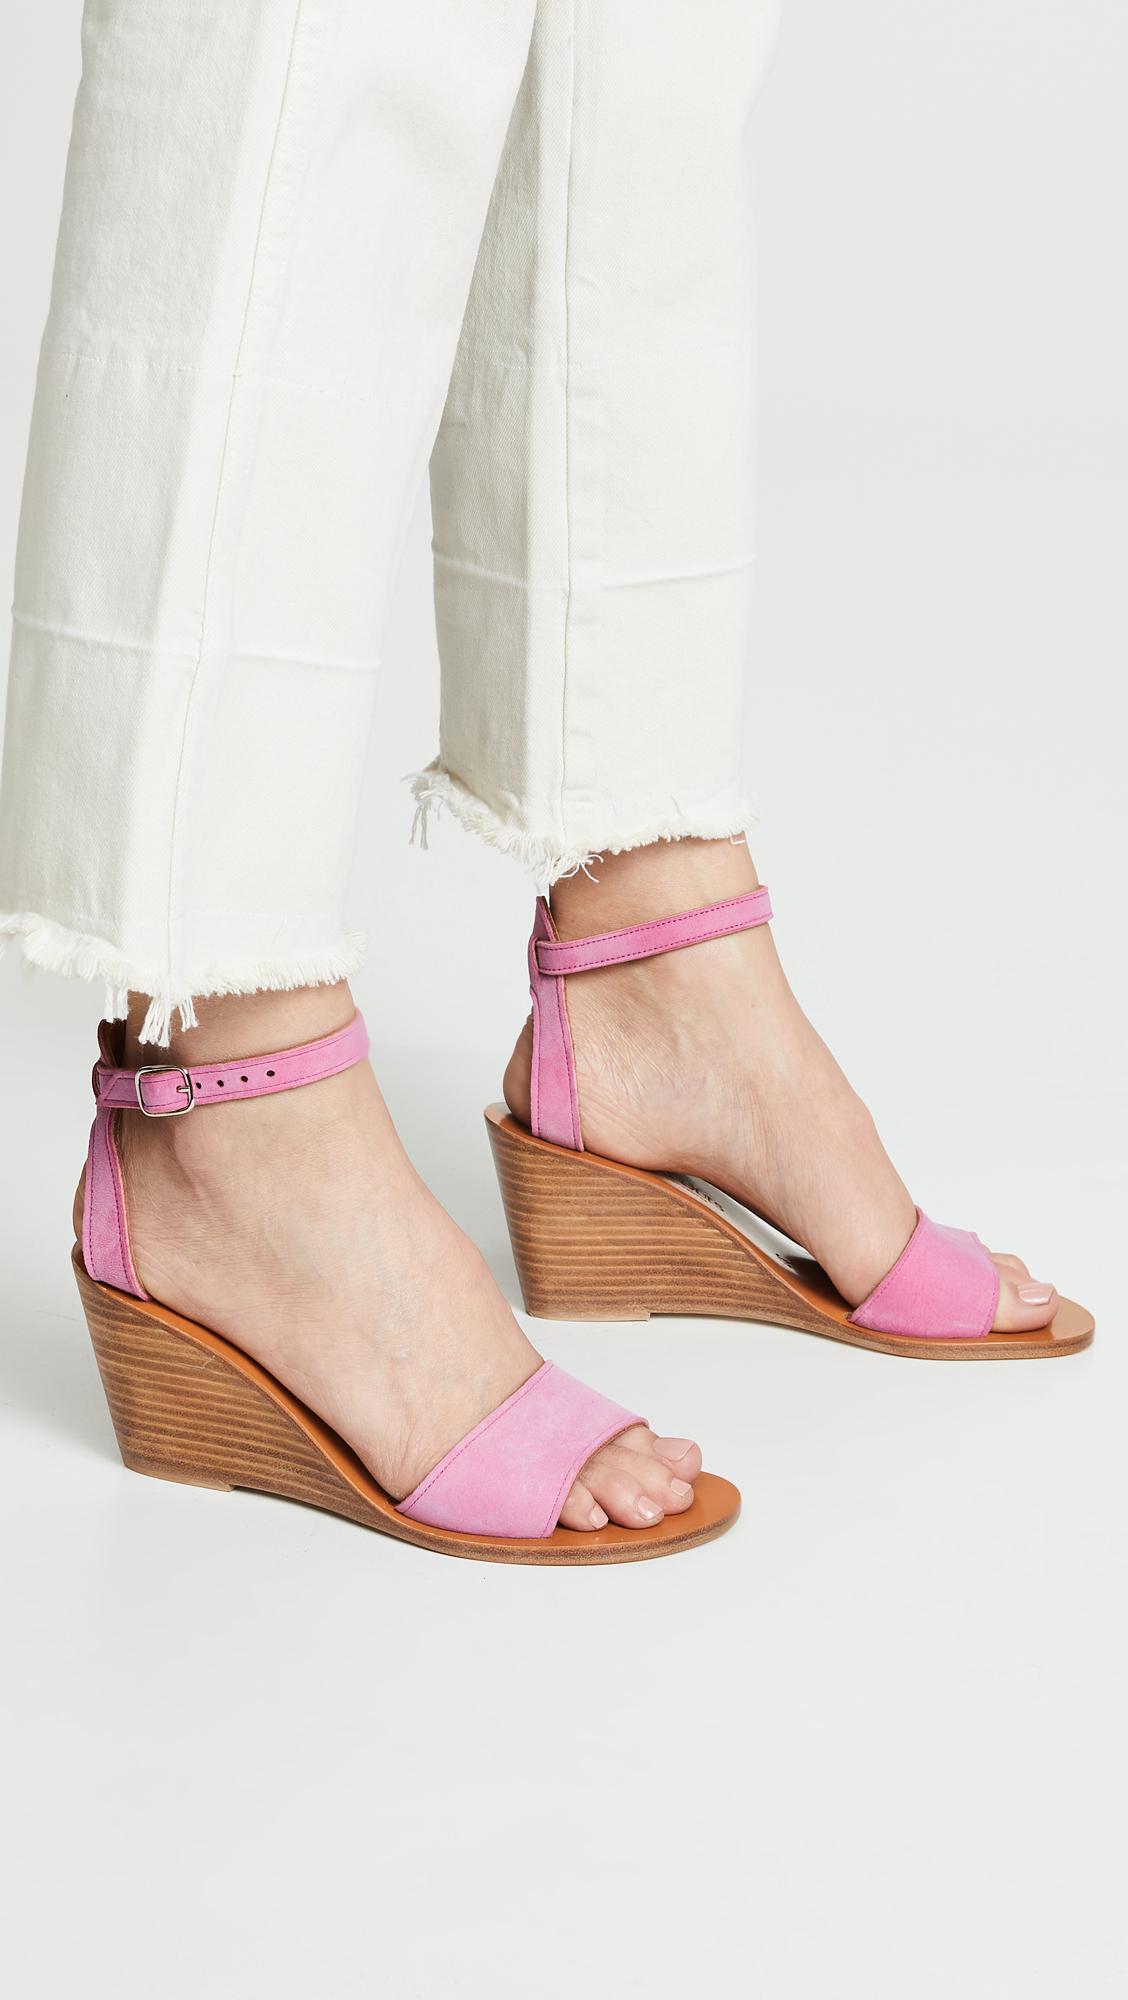 4c0ca0477c71 K. Jacques - Pink Sardaigne Wedge Sandals - Lyst. View fullscreen